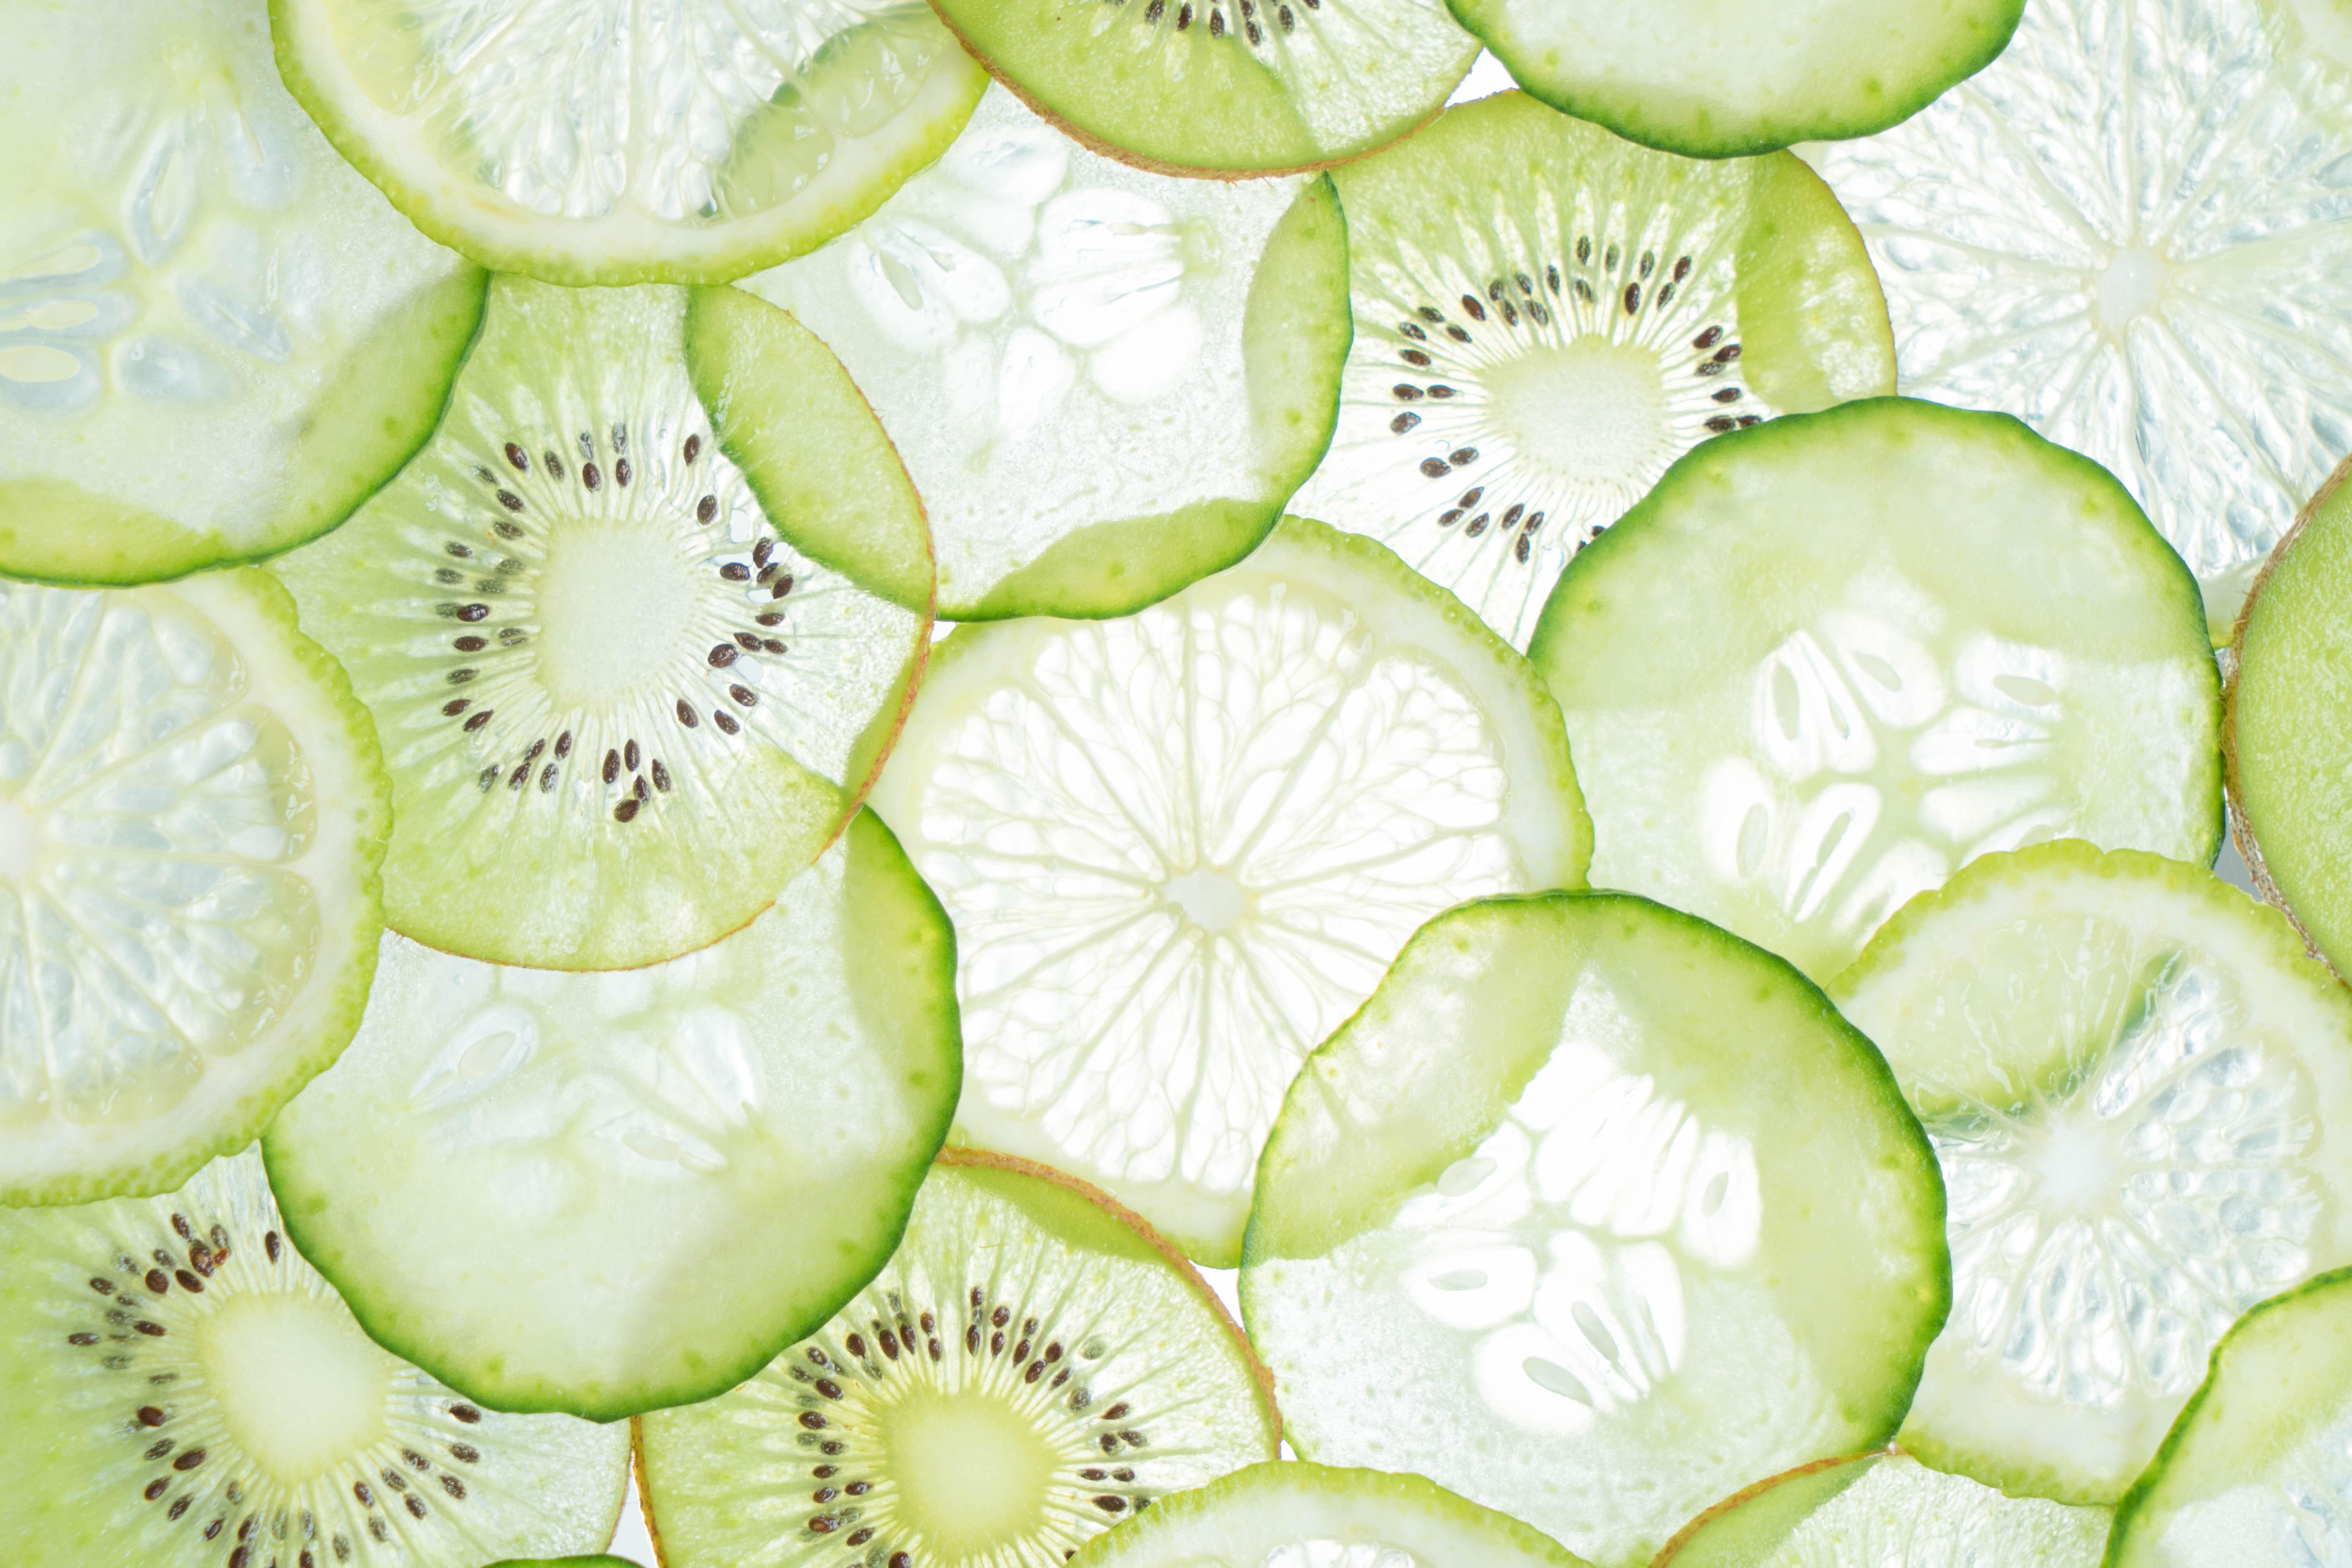 citrus fruit slices close up